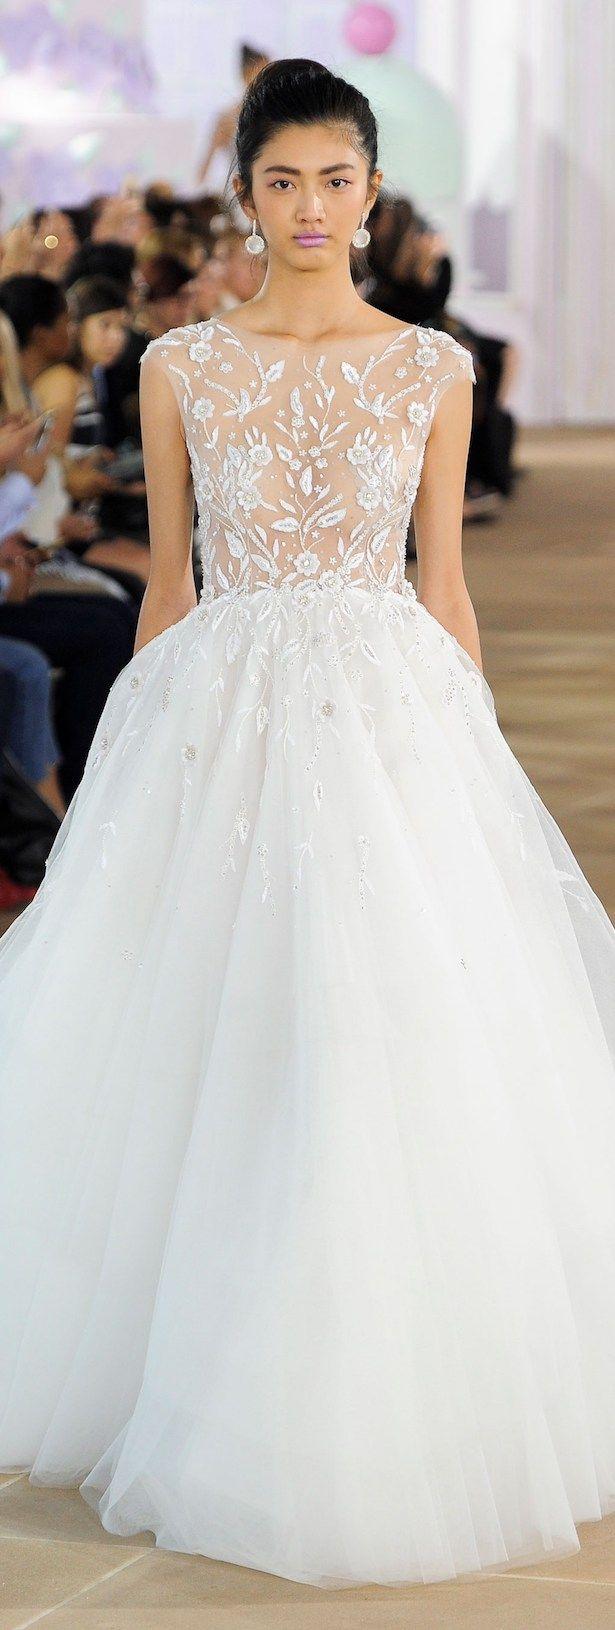 420 best Wedding Dresses images on Pinterest | Wedding bridesmaid ...